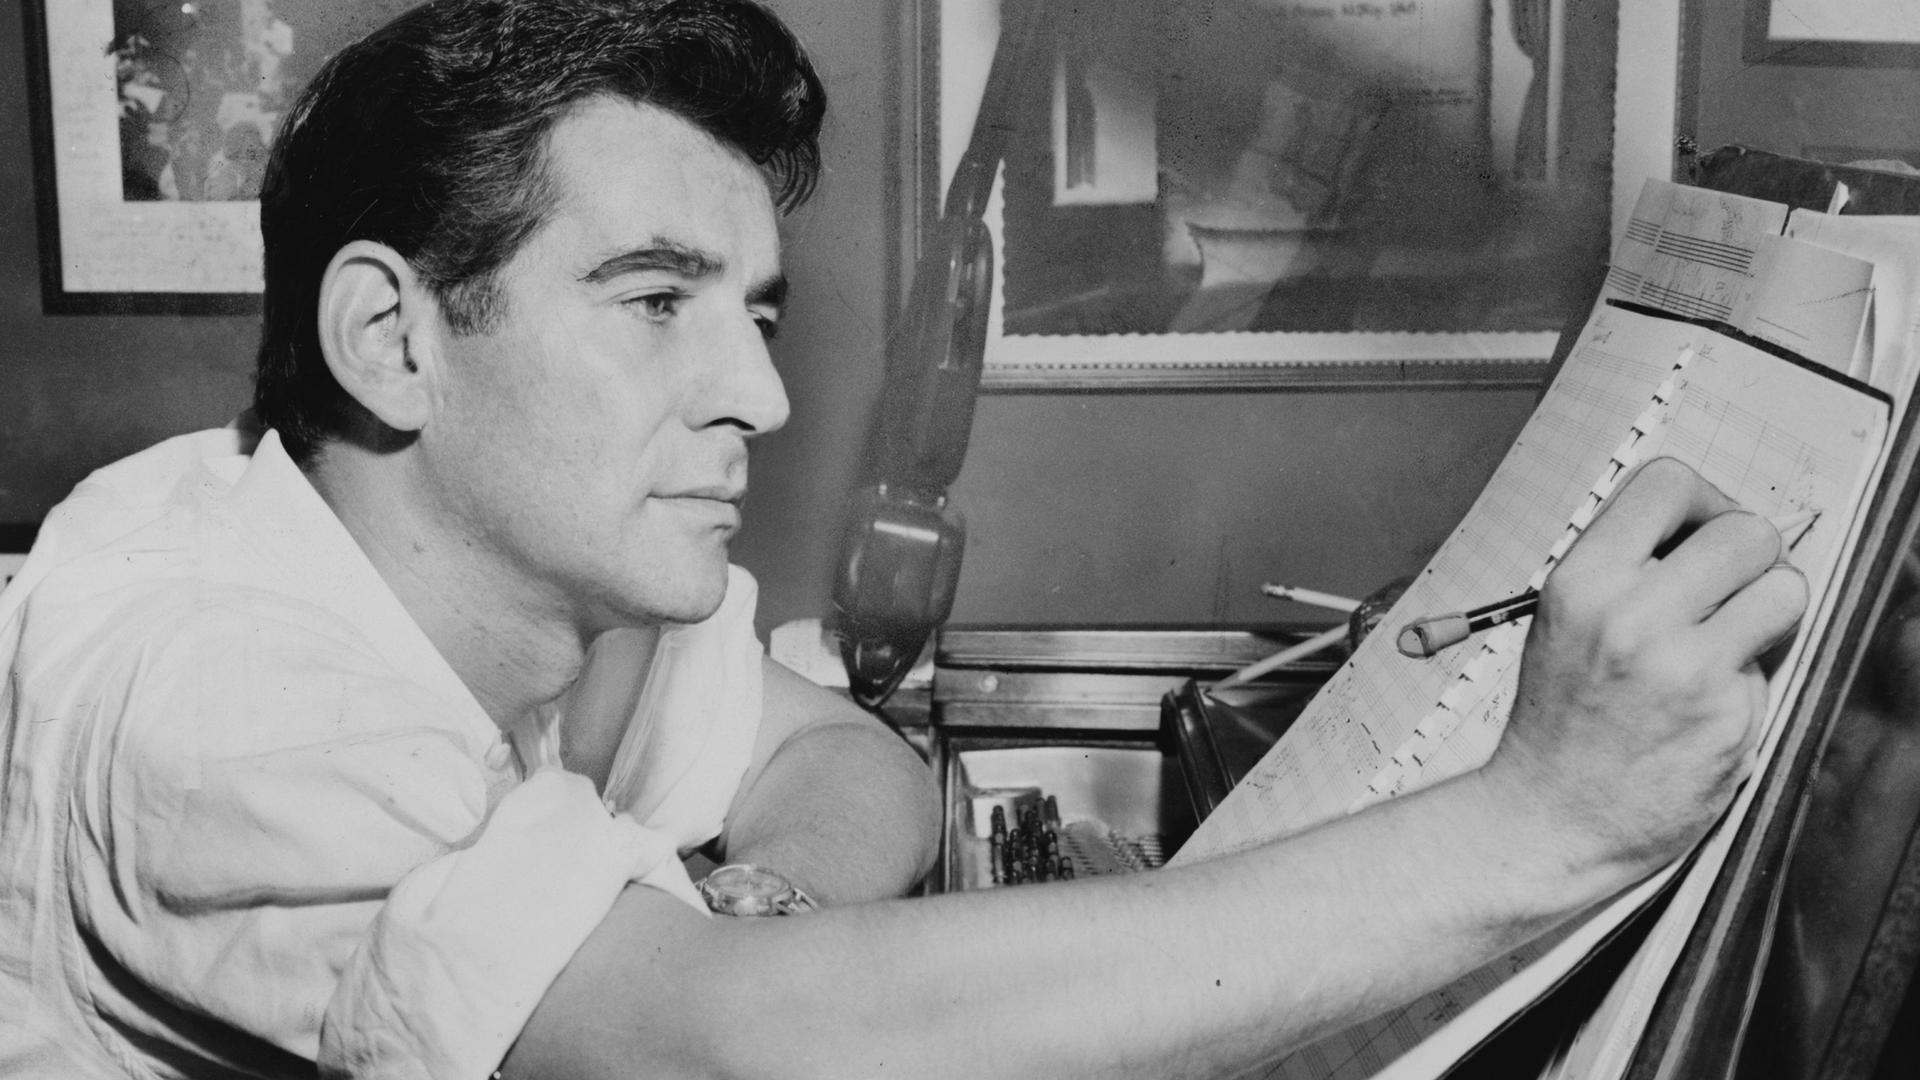 Leonard Bernstein \ Credit:Al Ravenna, 1955, courtesy of the Library of Congress